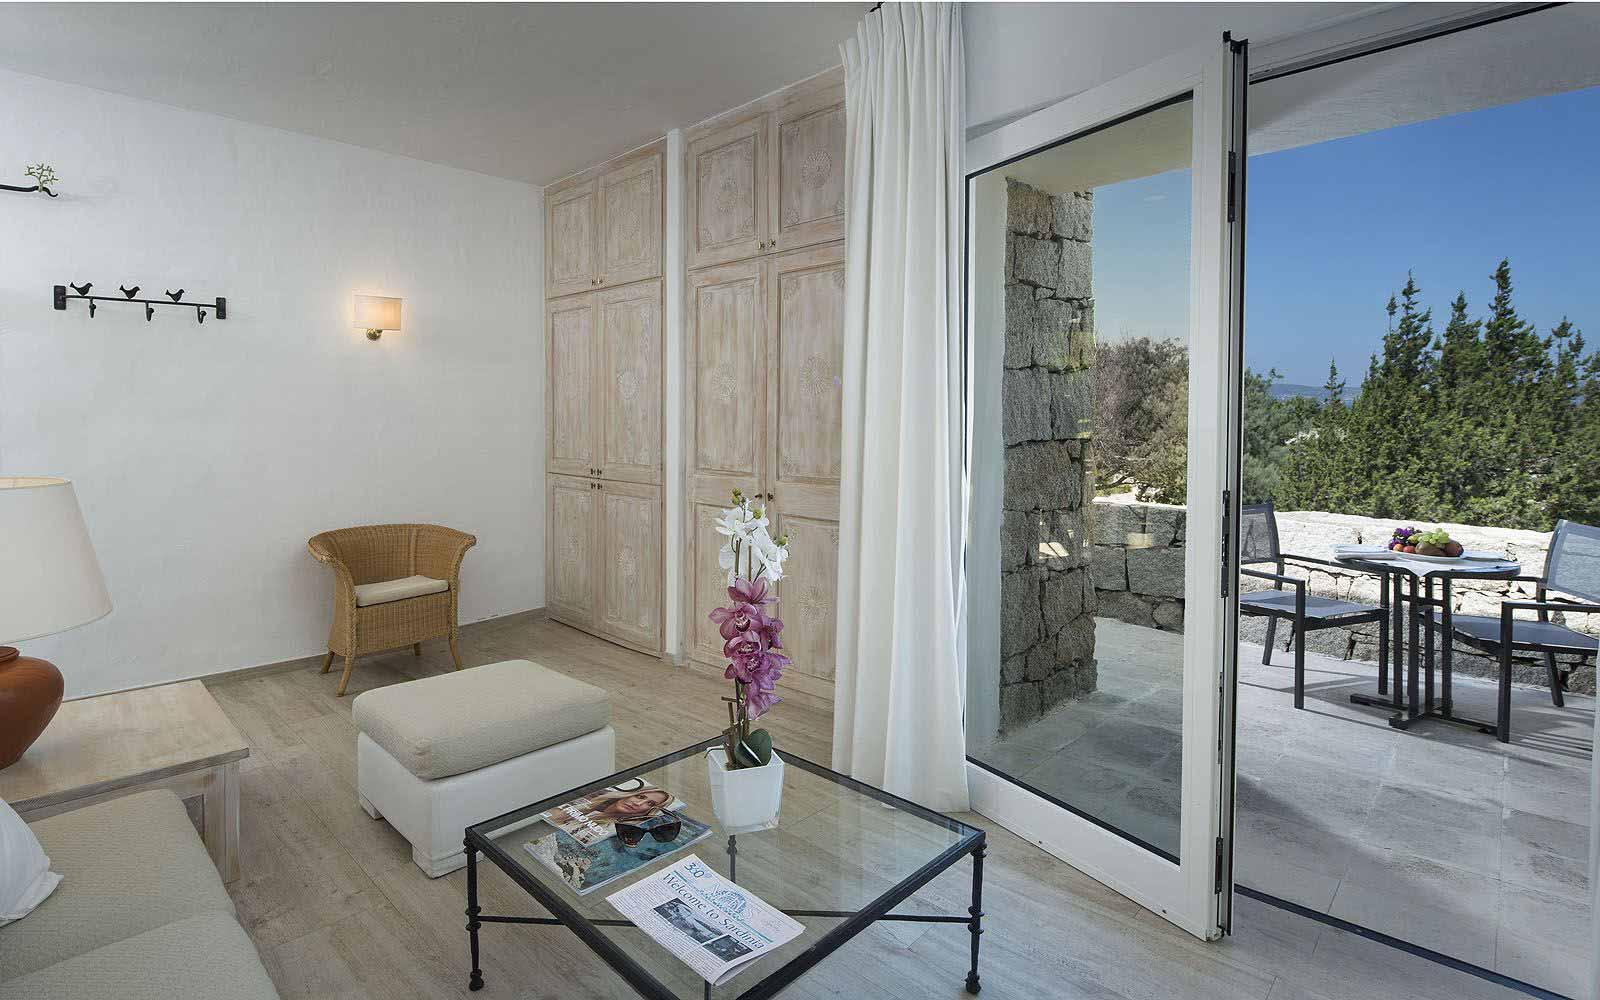 Junior Suite lounge area and patio at the Grand Relais dei Nuraghi